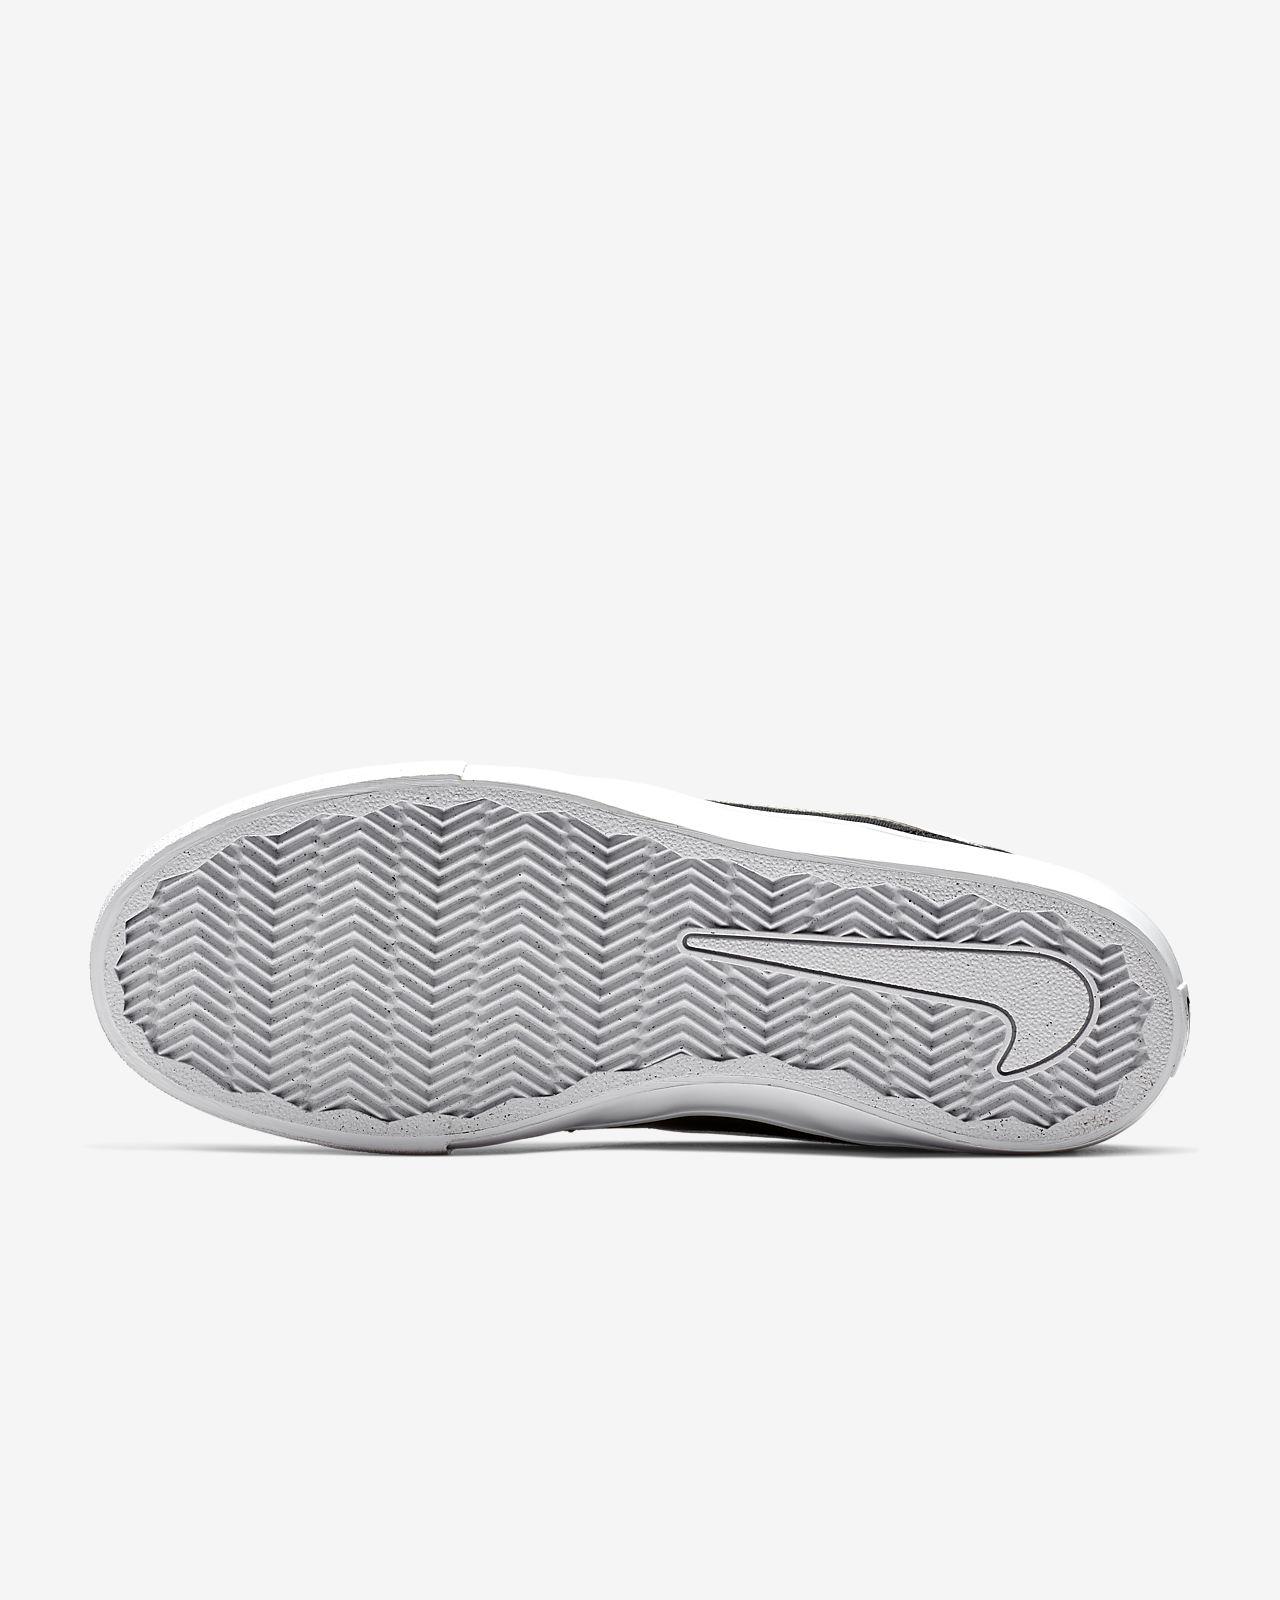 premium selection 9ff3d 3c7ba Nike SB Portmore 2 Solarsoft Mid Canvas Men's Skate Shoe